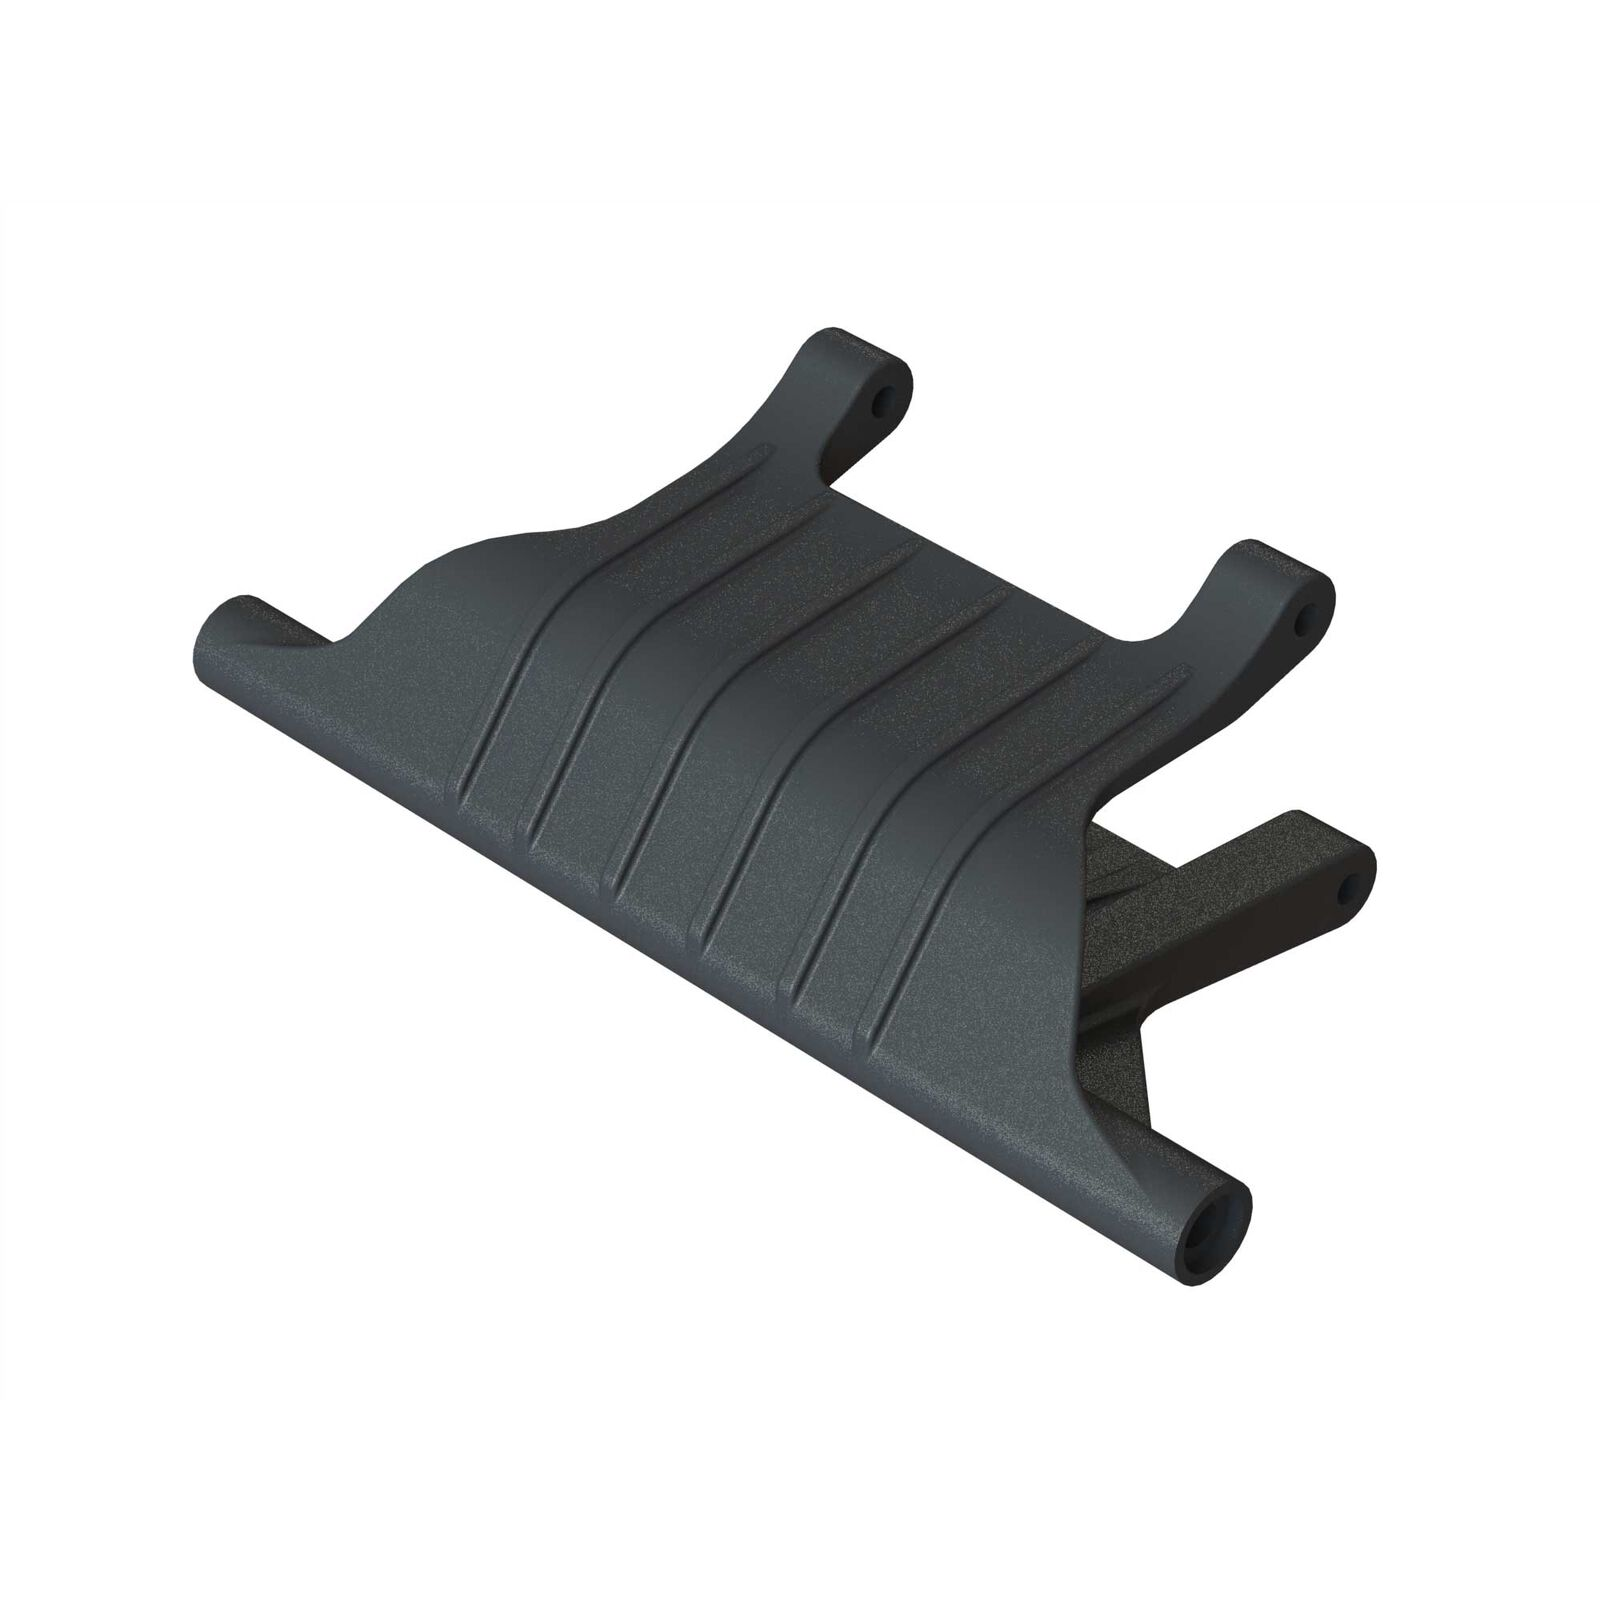 Wheelie Bar Frame